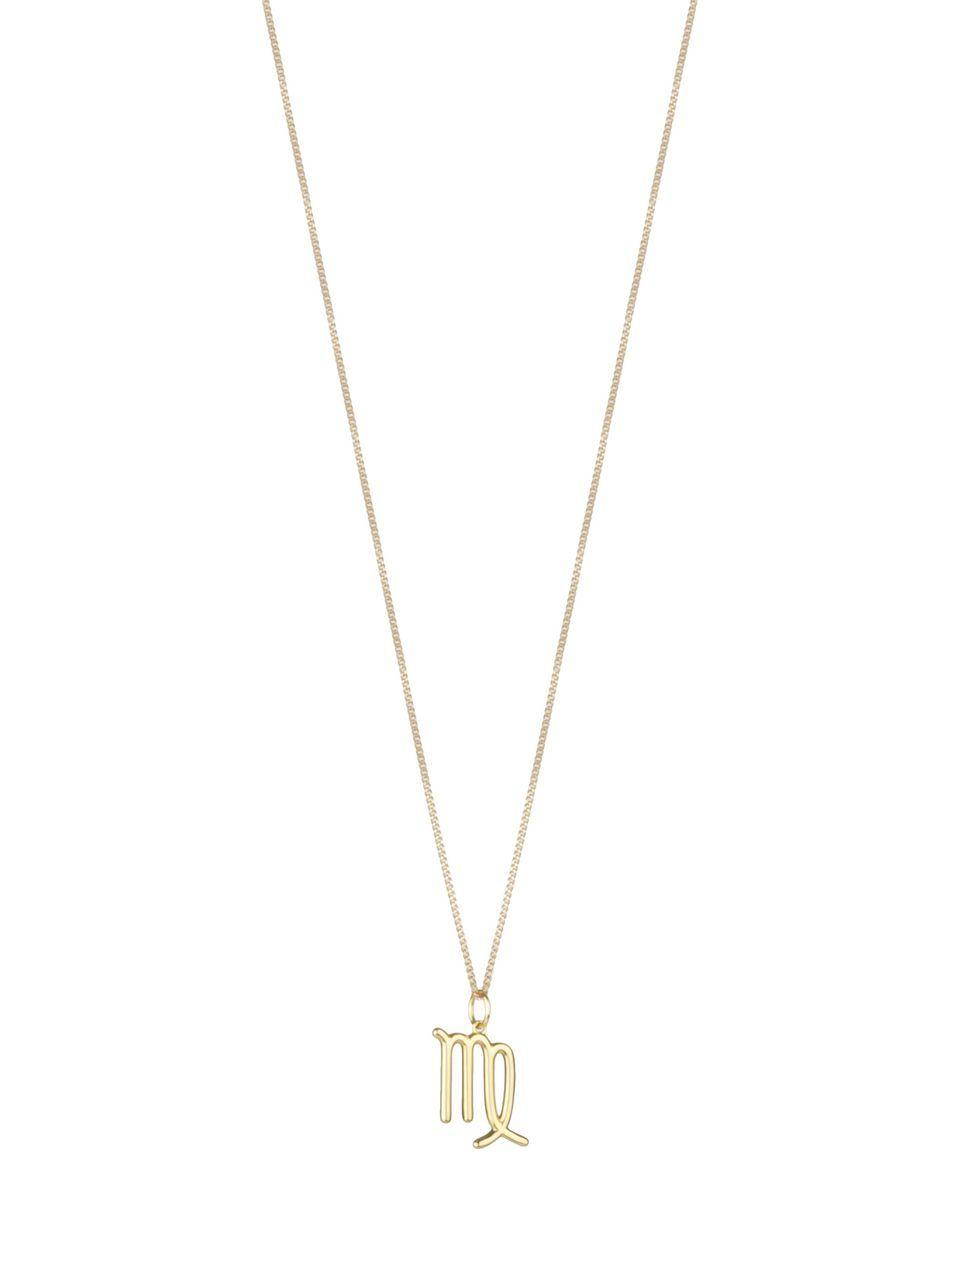 Christmas present zodiac jewelry Triangle zodiac sign Virgo Necklace,Virgo Necklace,Gift ideas for Virgo astrology jewelry Holiday gift